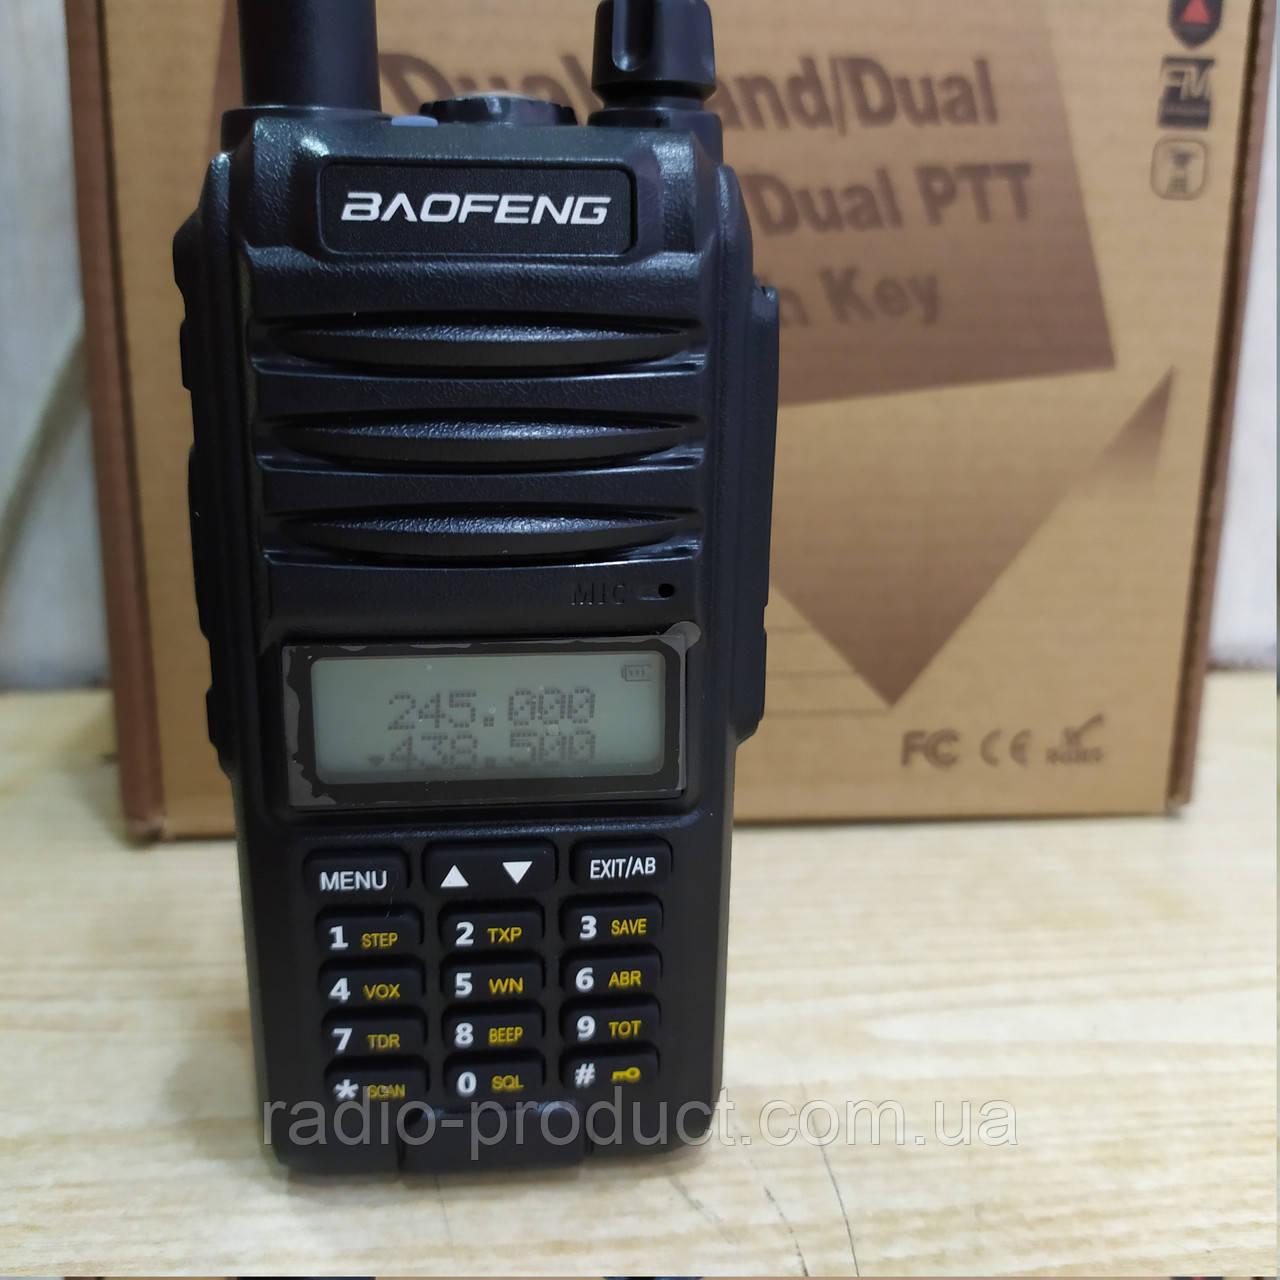 Baofeng BF-A58S, трёхдиапазонная радиостанция